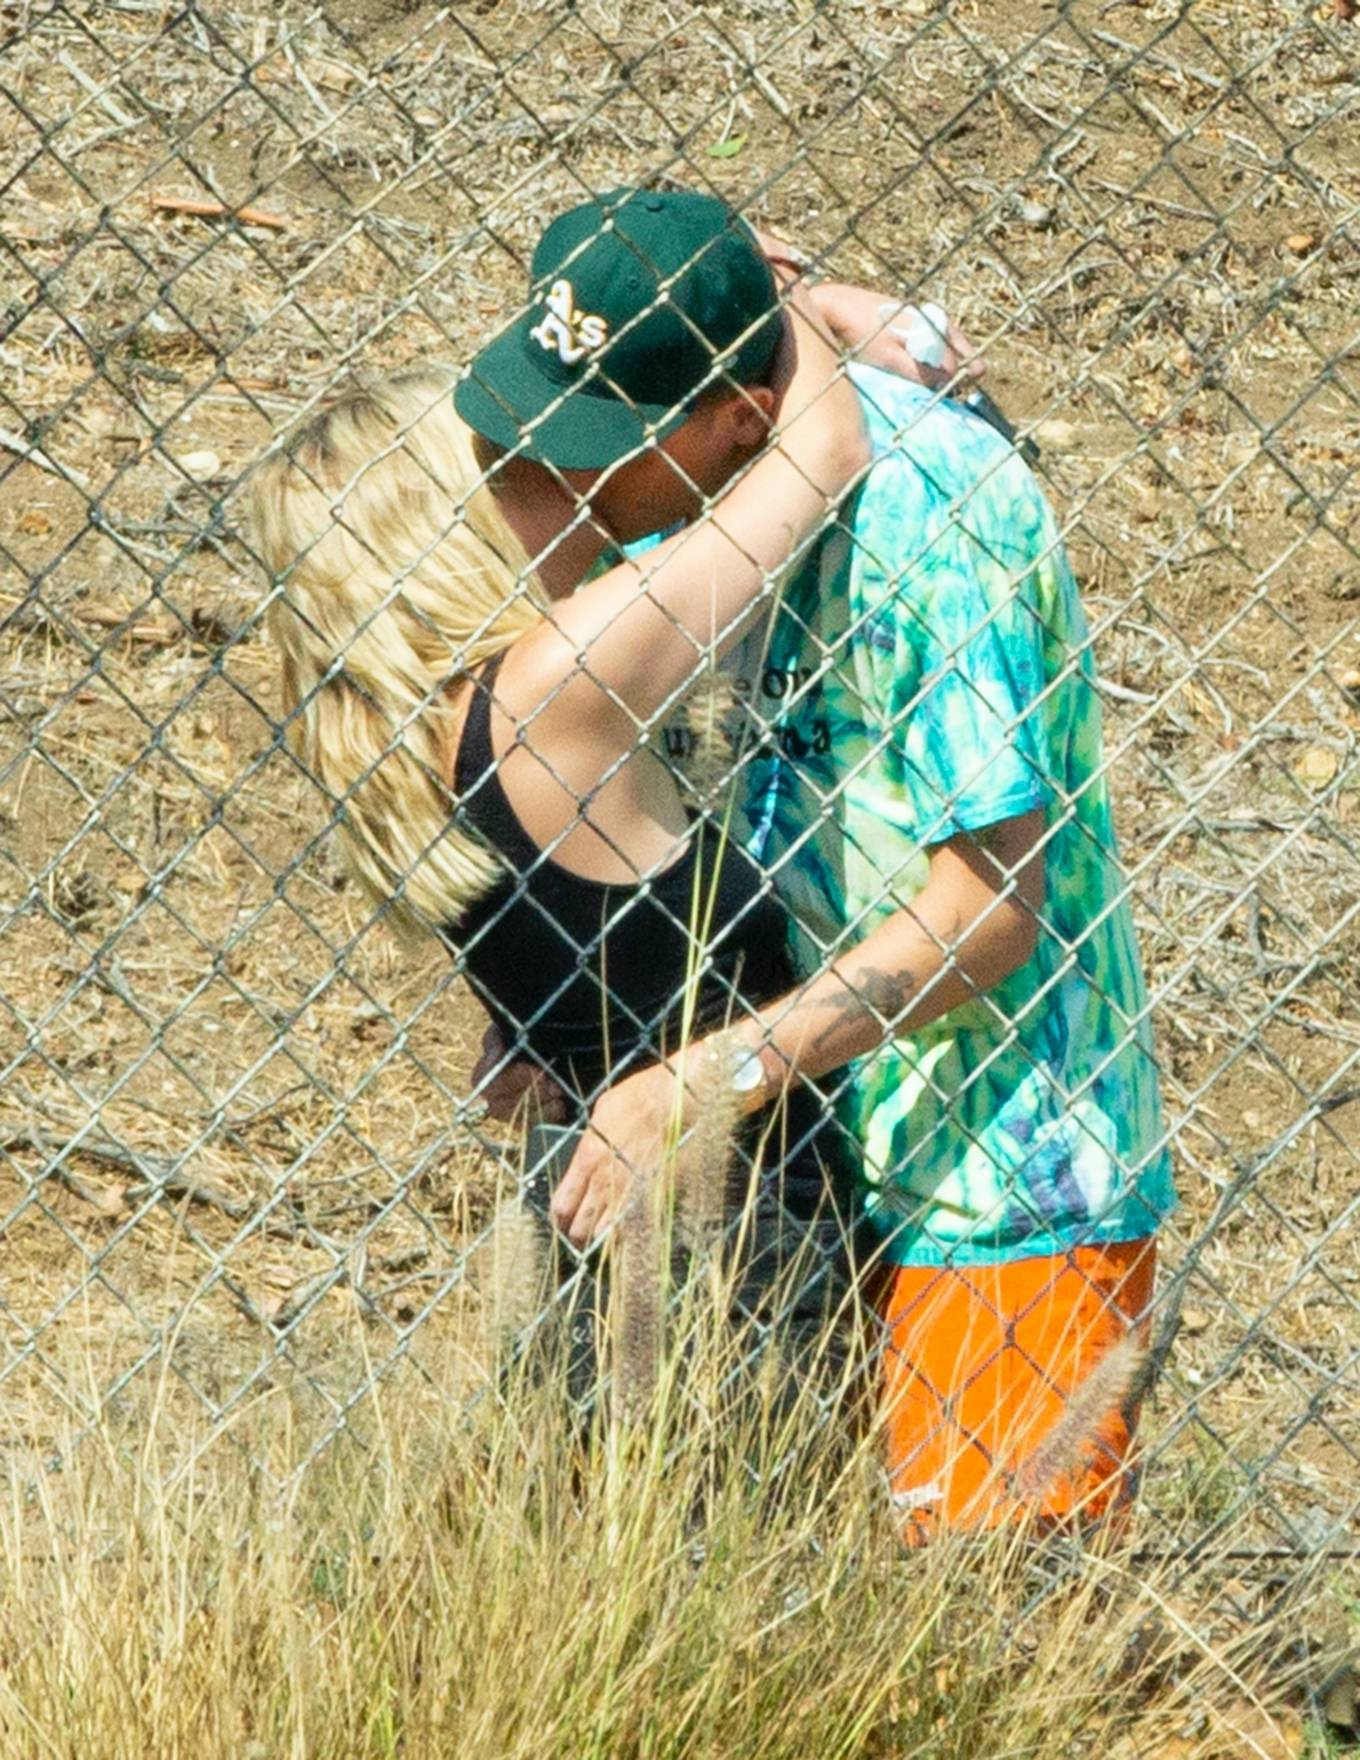 Ashley Benson 2020 : Ashley Benson and boyfriend G-Eazy as she arrives at his video shoot in Malibu-16